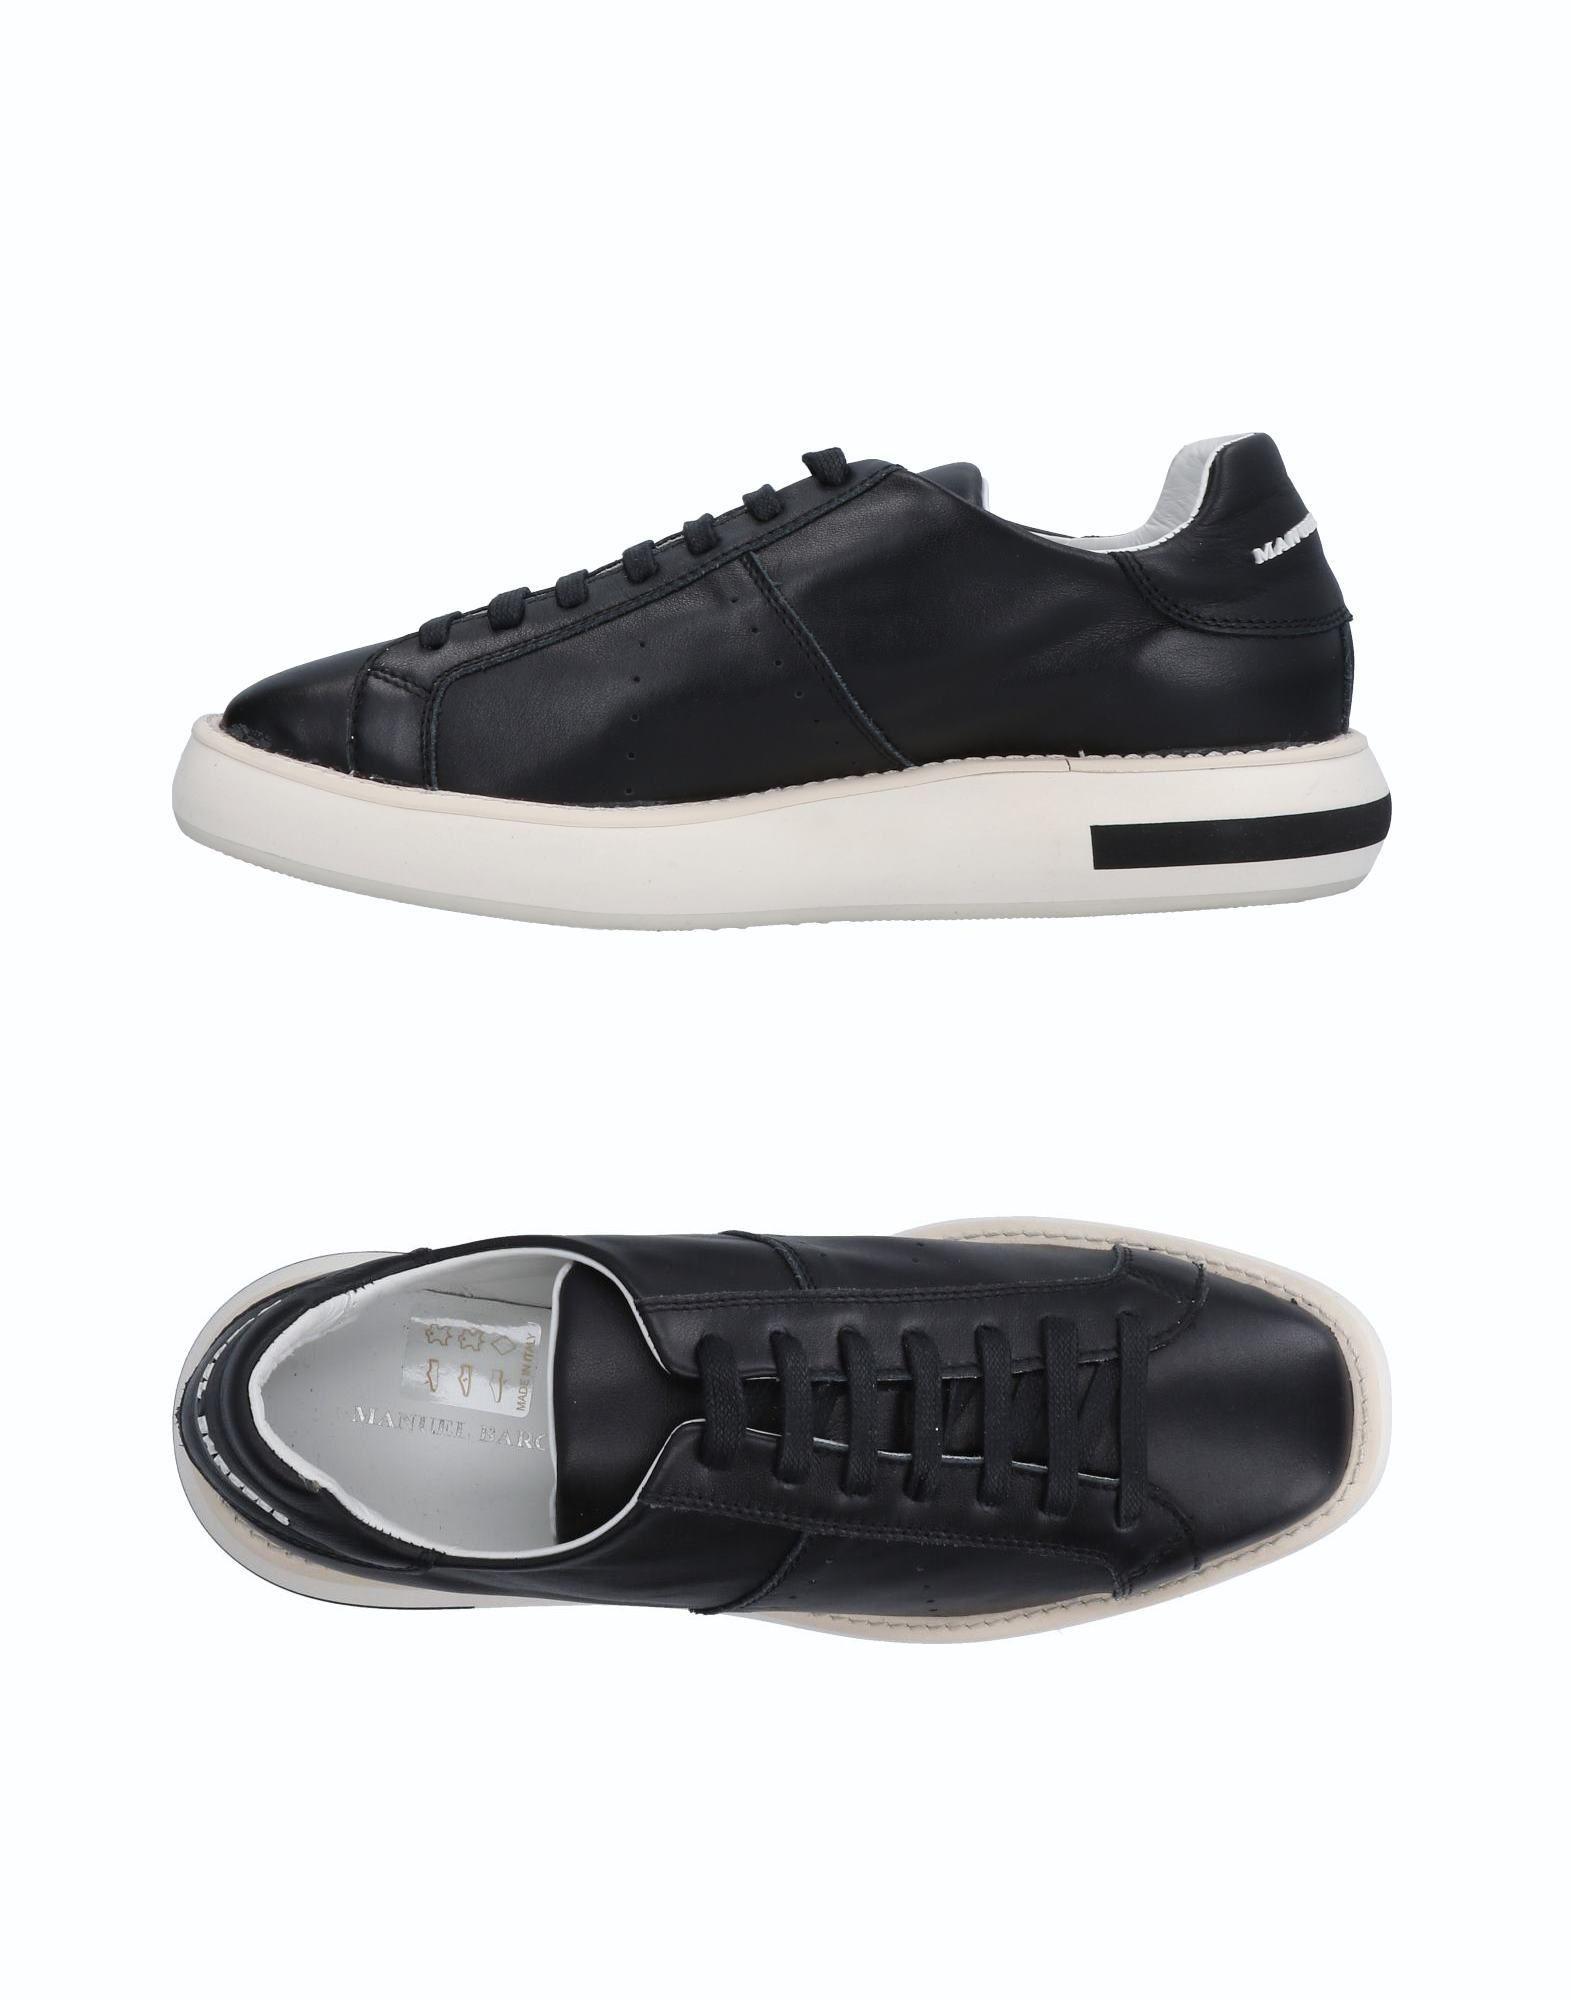 Sneakers Manuel Barceló Donna - 11512539DS 11512539DS 11512539DS 3ee714